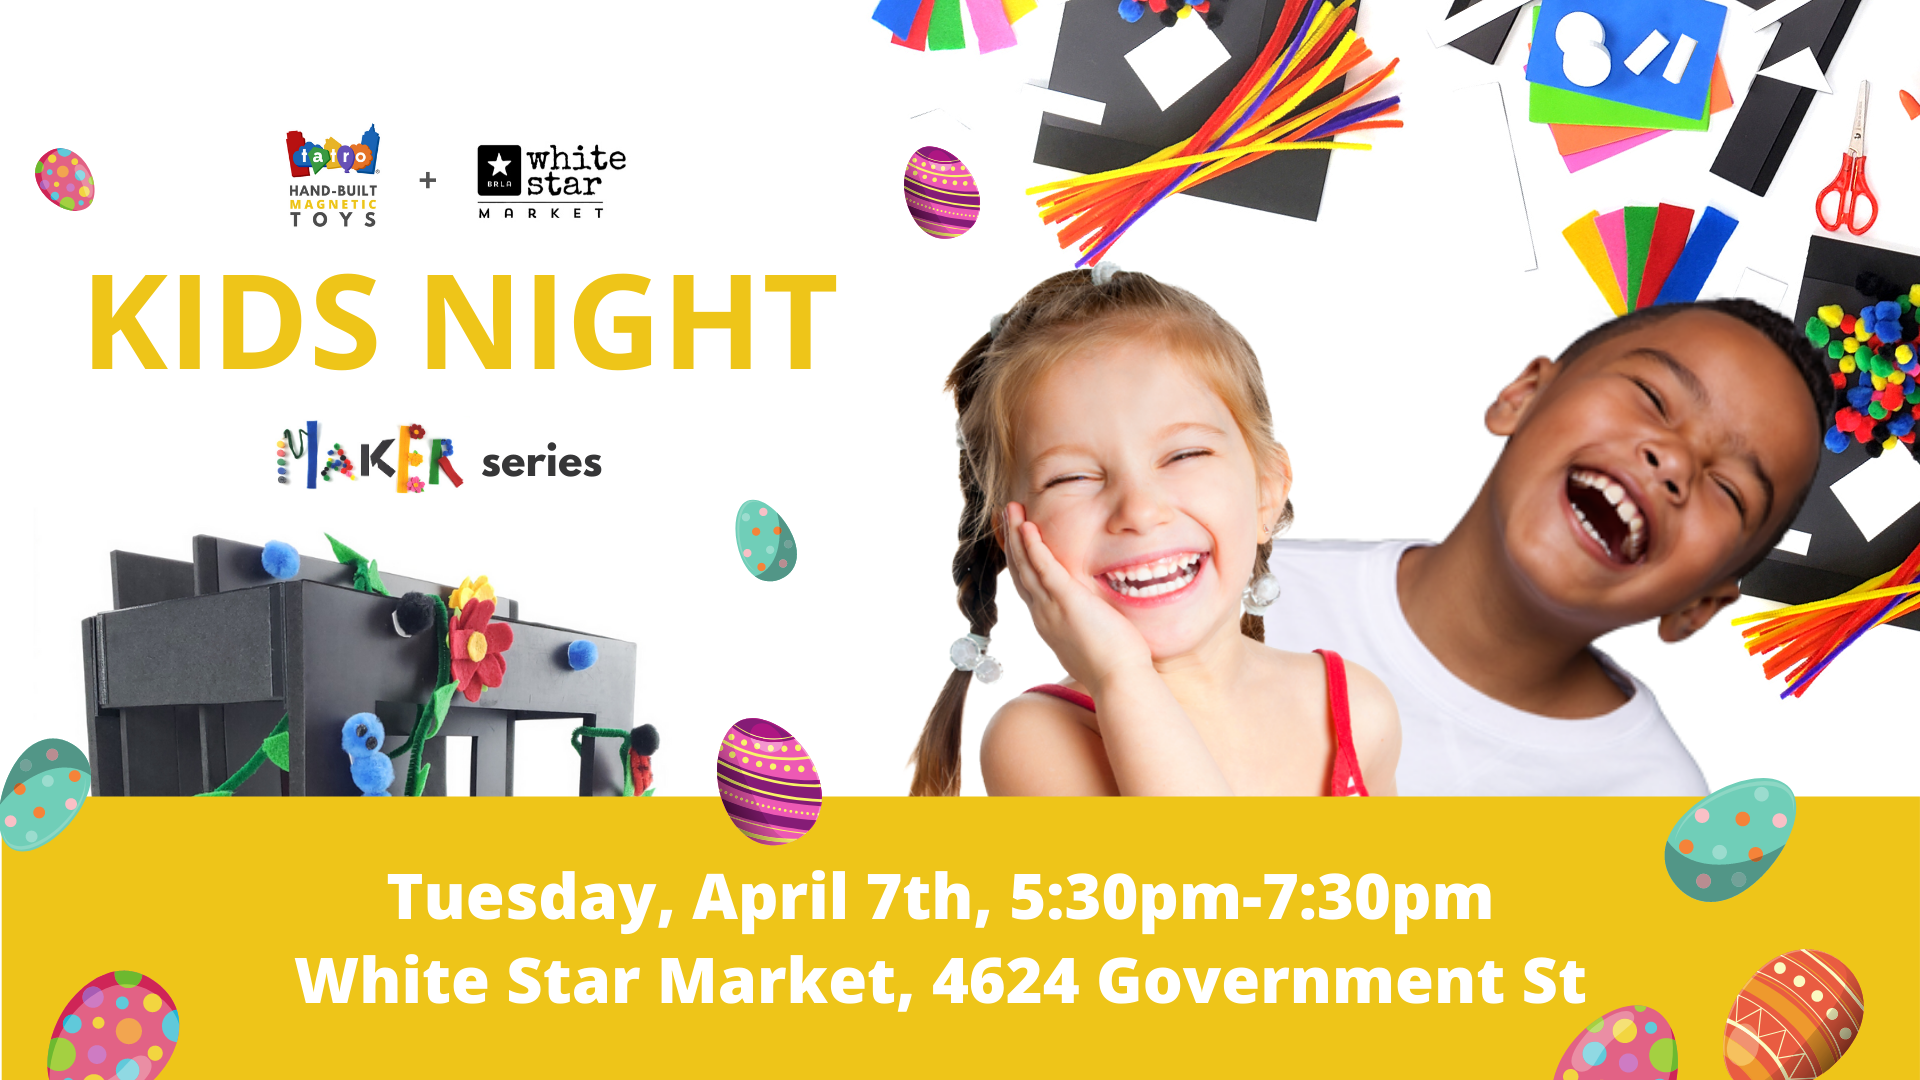 Kids Night at White Star Market